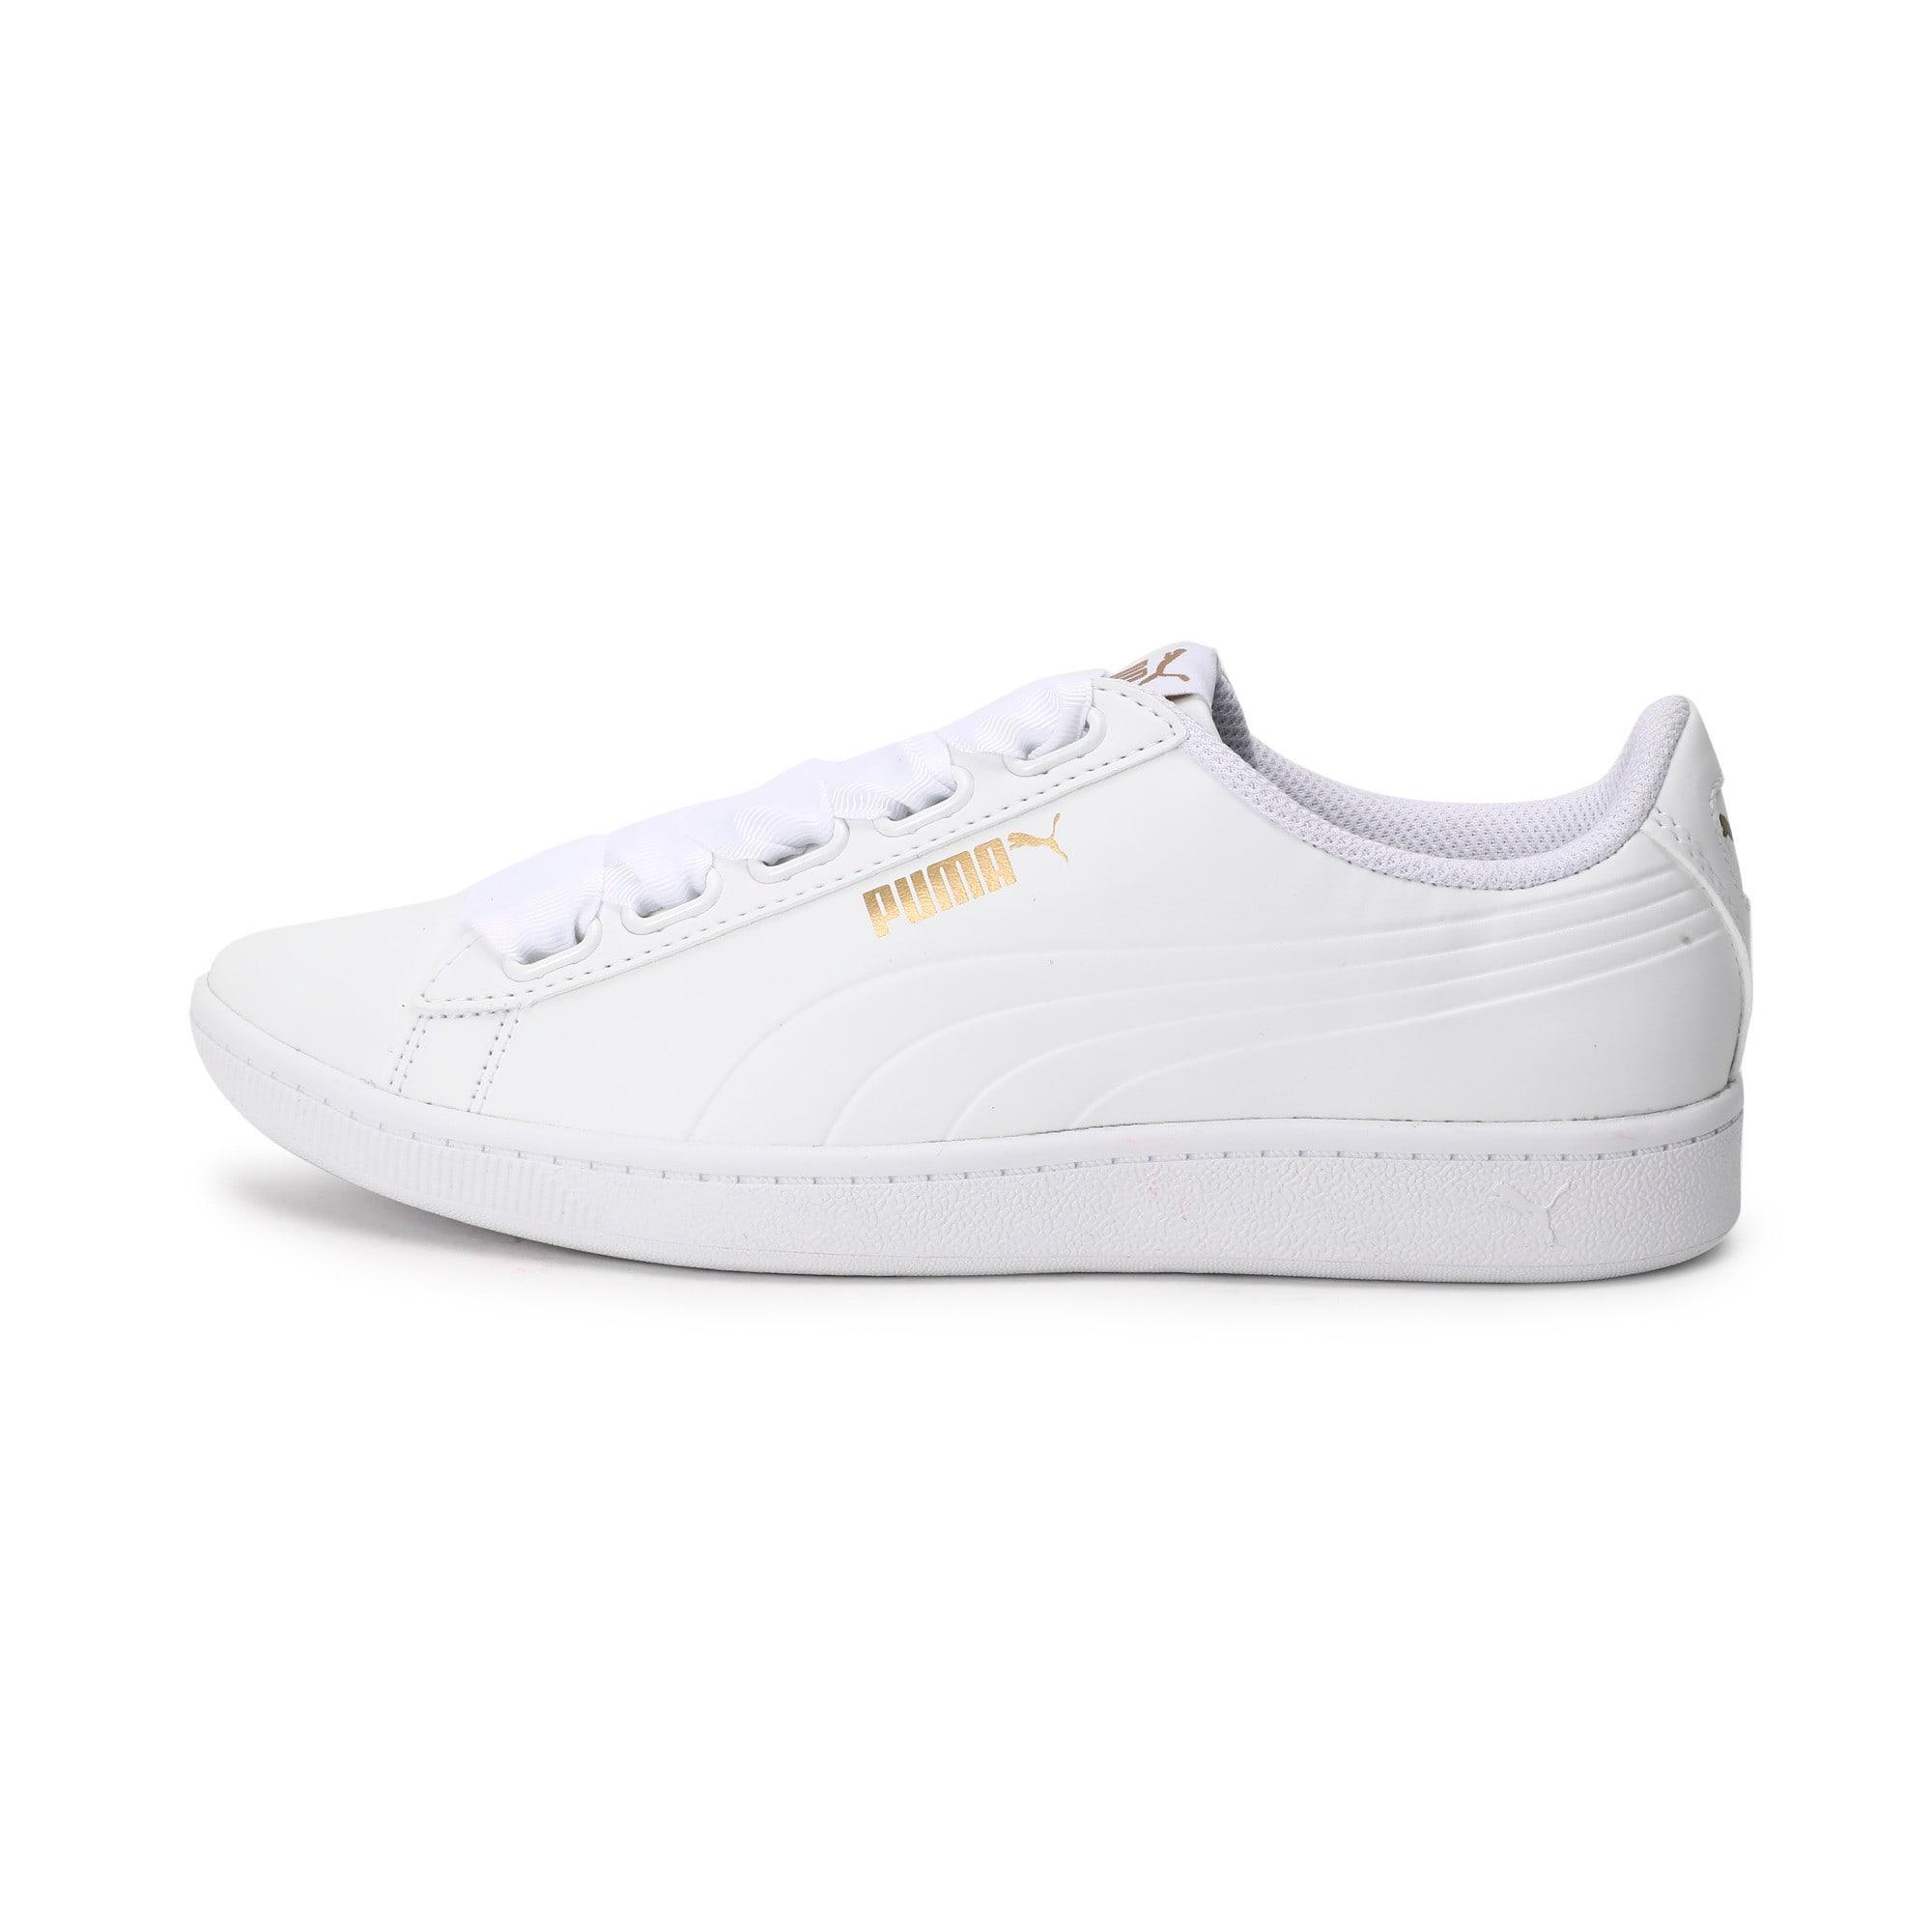 Thumbnail 1 of Women's Puma Vikky Ribbon Sneakers, Puma White-Puma White, medium-IND